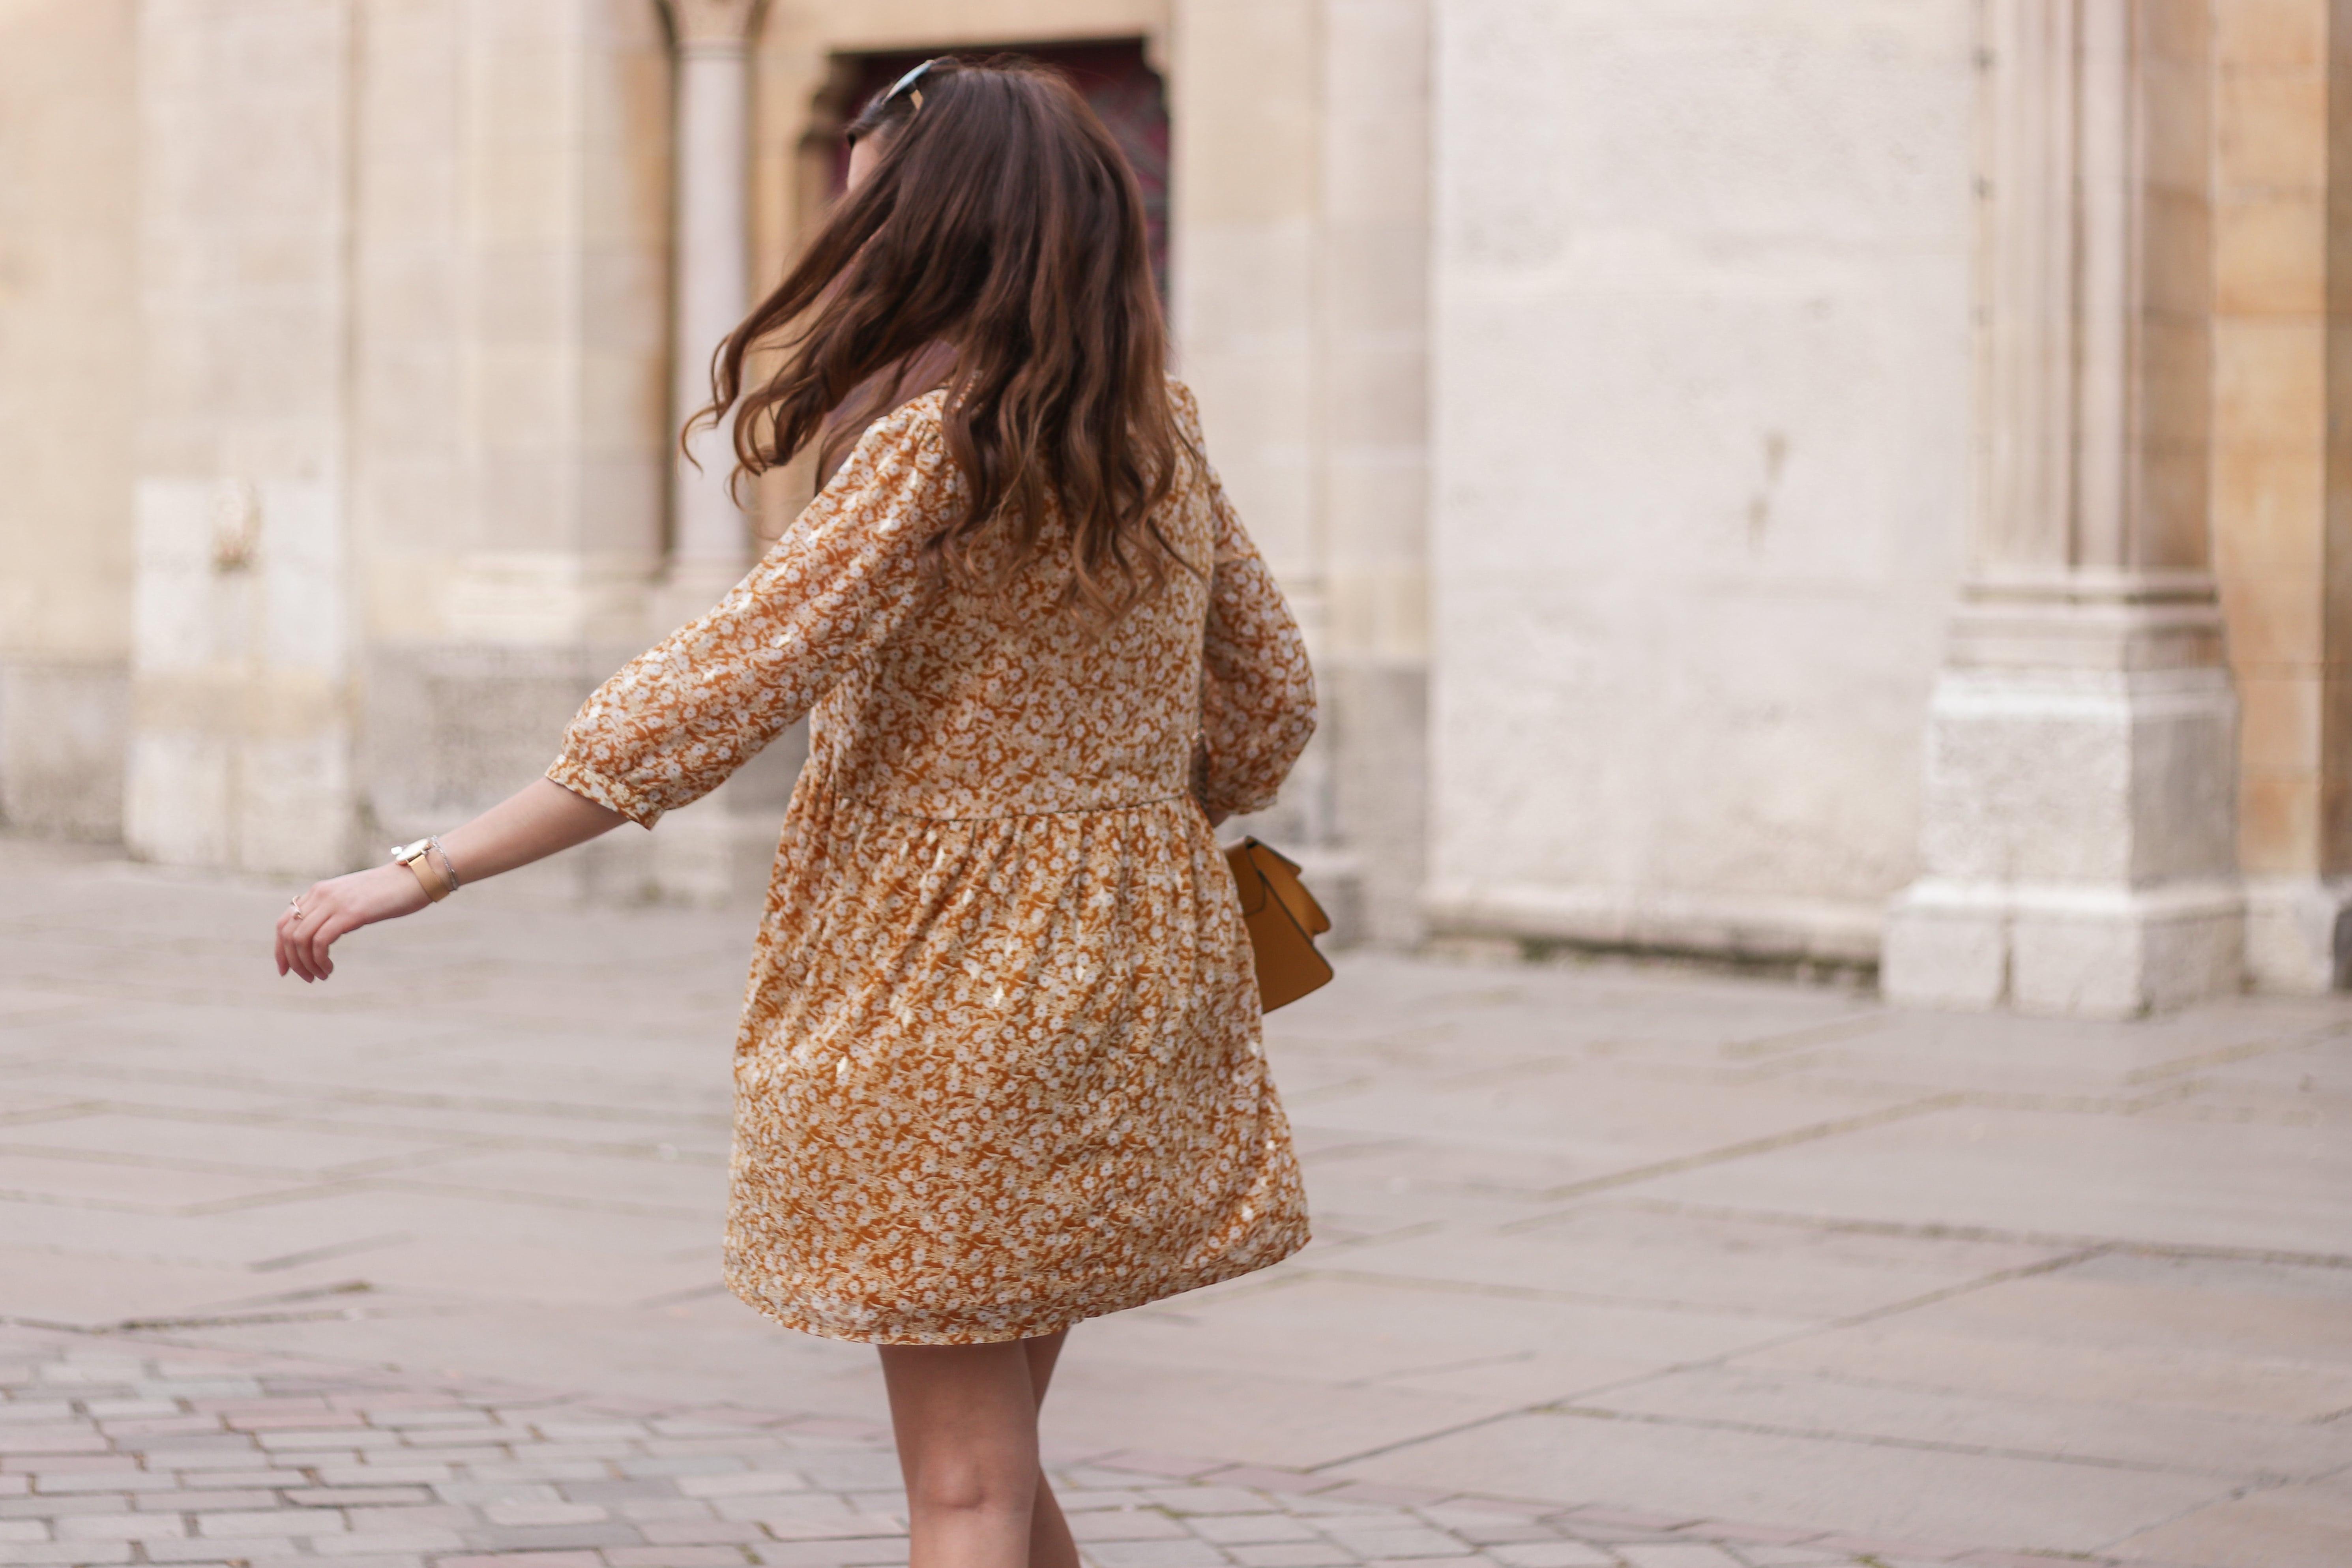 look robe jaune, robe jaune fleurie, robe jaune moutarde, robe jaune promod, robe jaune printemps, A Little Daisy Blog, Blog Lifestyle, Blog Lifestyle Lyon, Blog Beauté, Blog Beauté Lyon, Blog Mode, Blog Mode Lyon